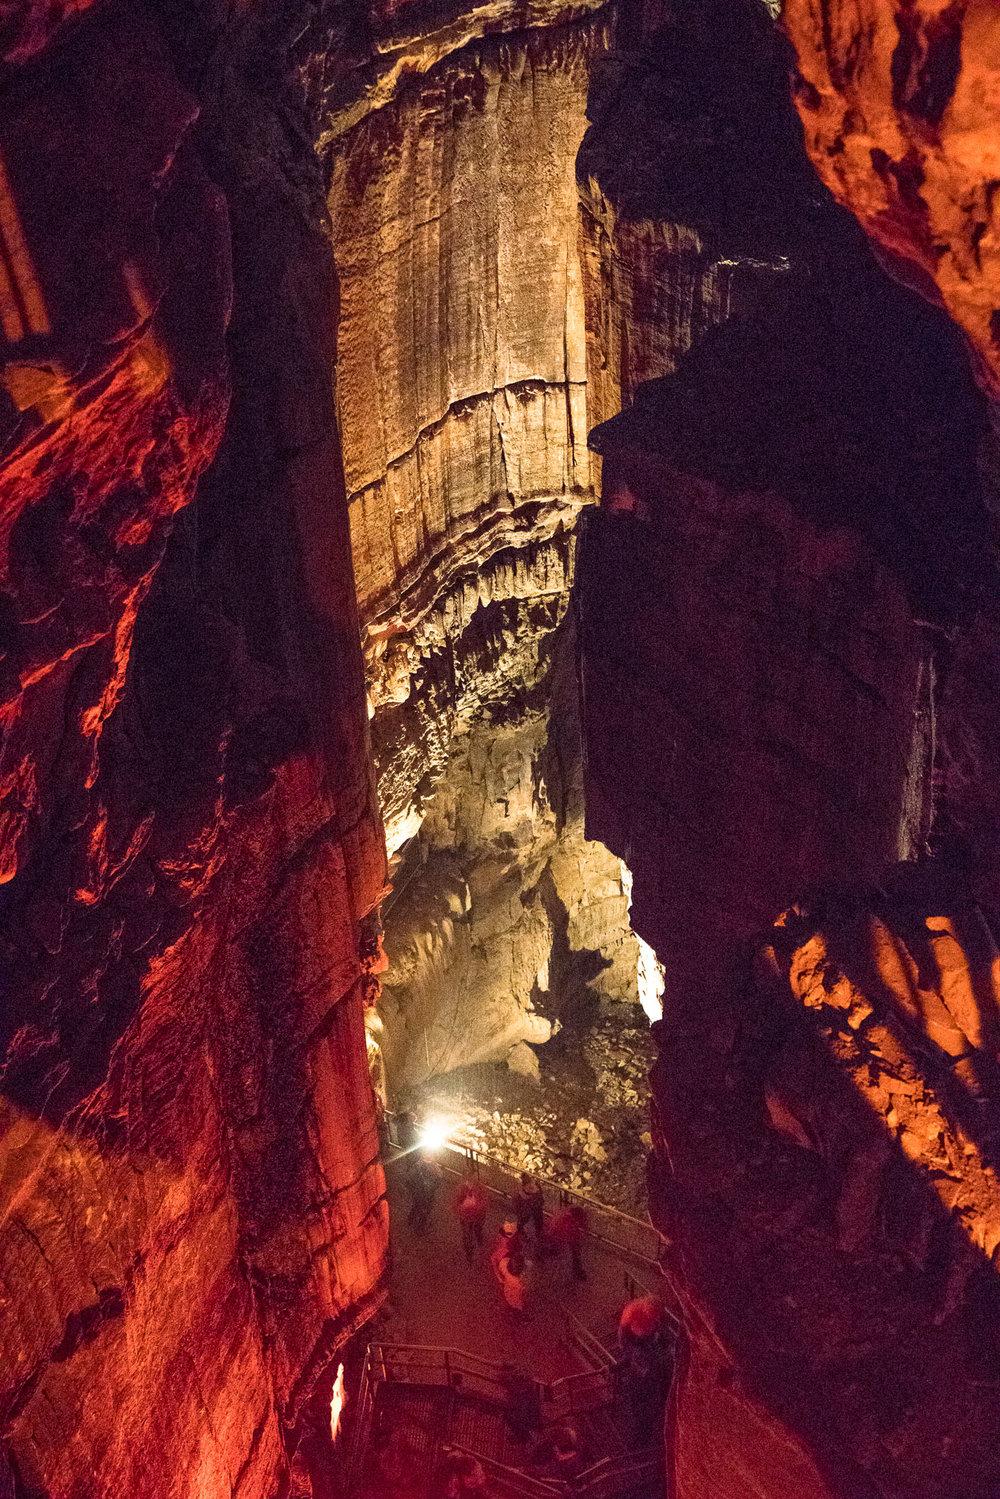 mammoth-cave-28.jpg